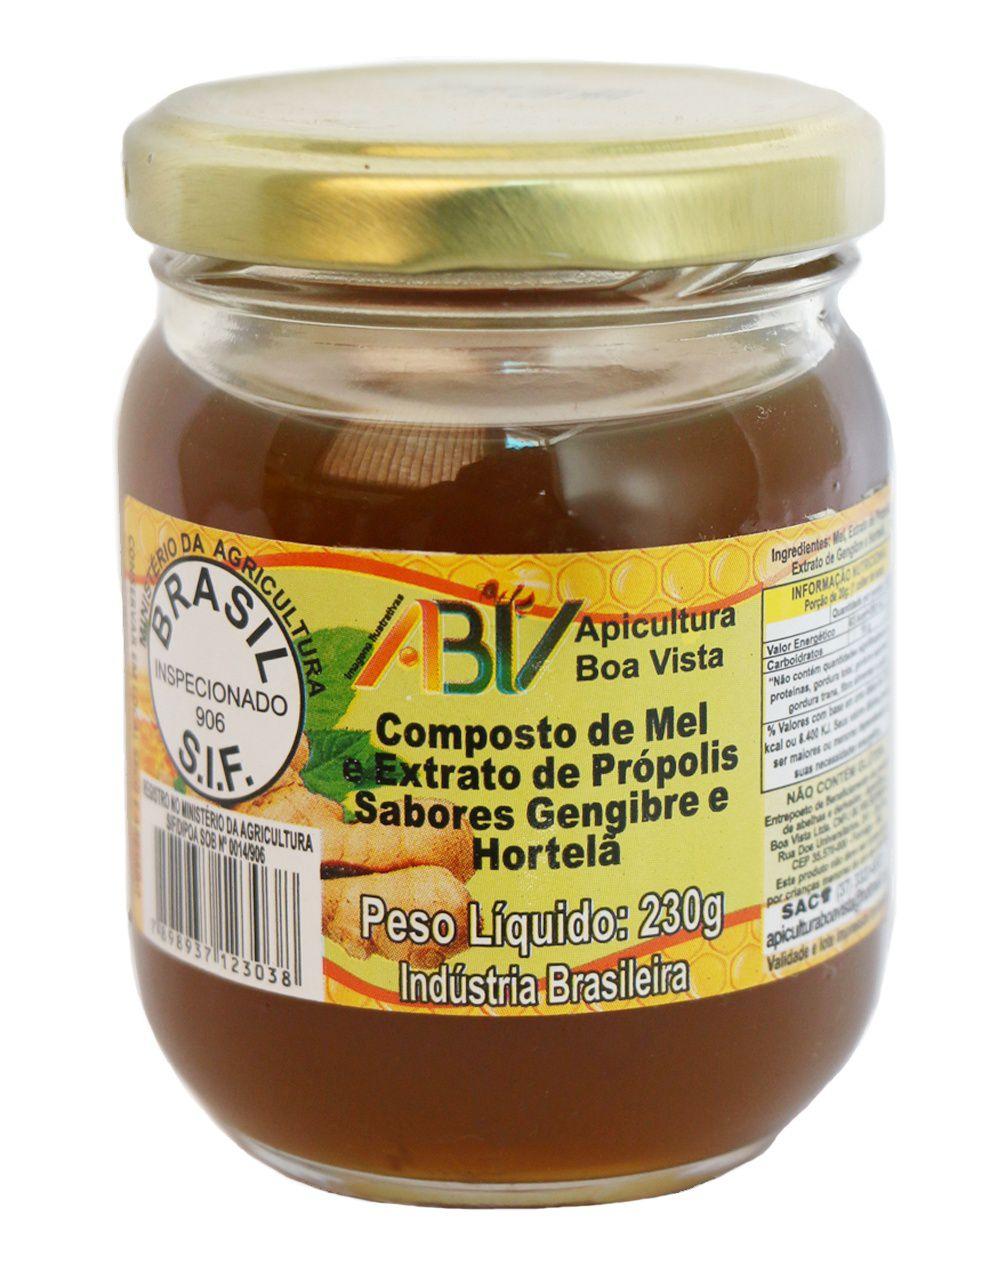 Composto de mel e extrato de própolis sabor gengibre e hortelã pote vidro 230g